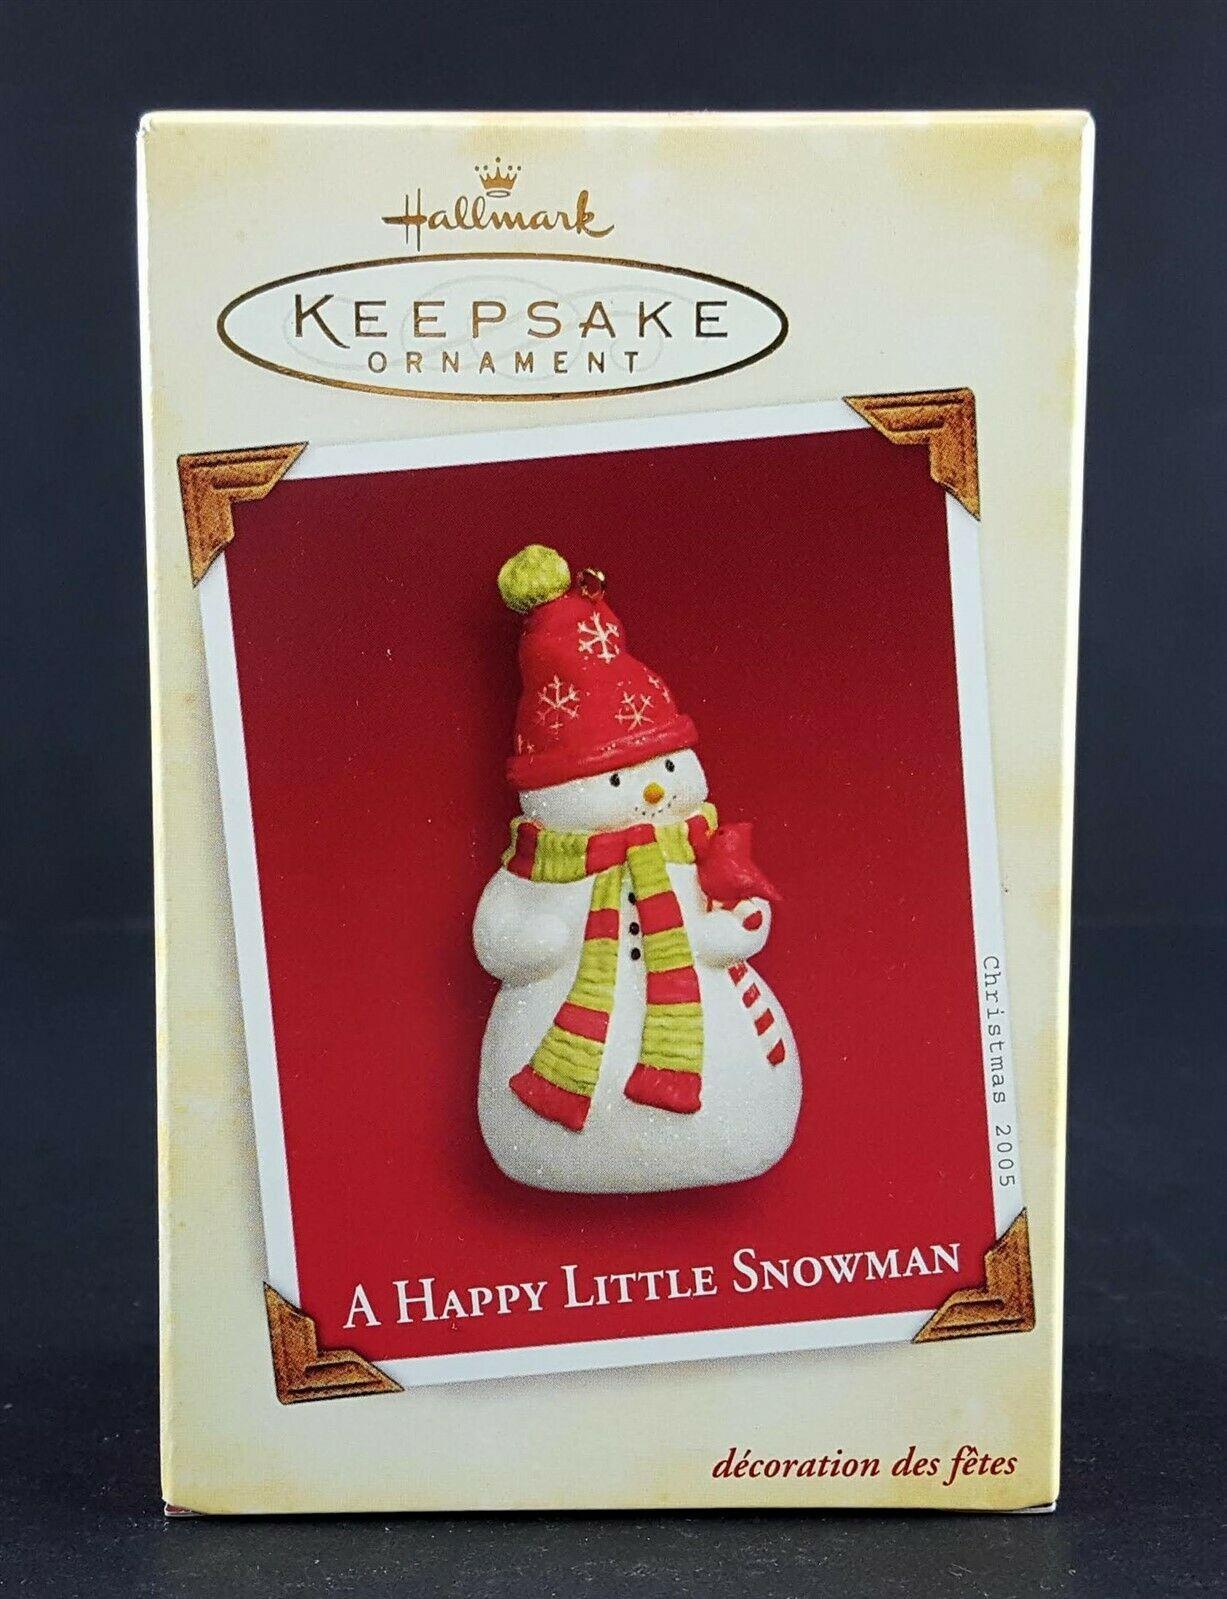 Hallmark Ornament A Happy Little Snowman 2005